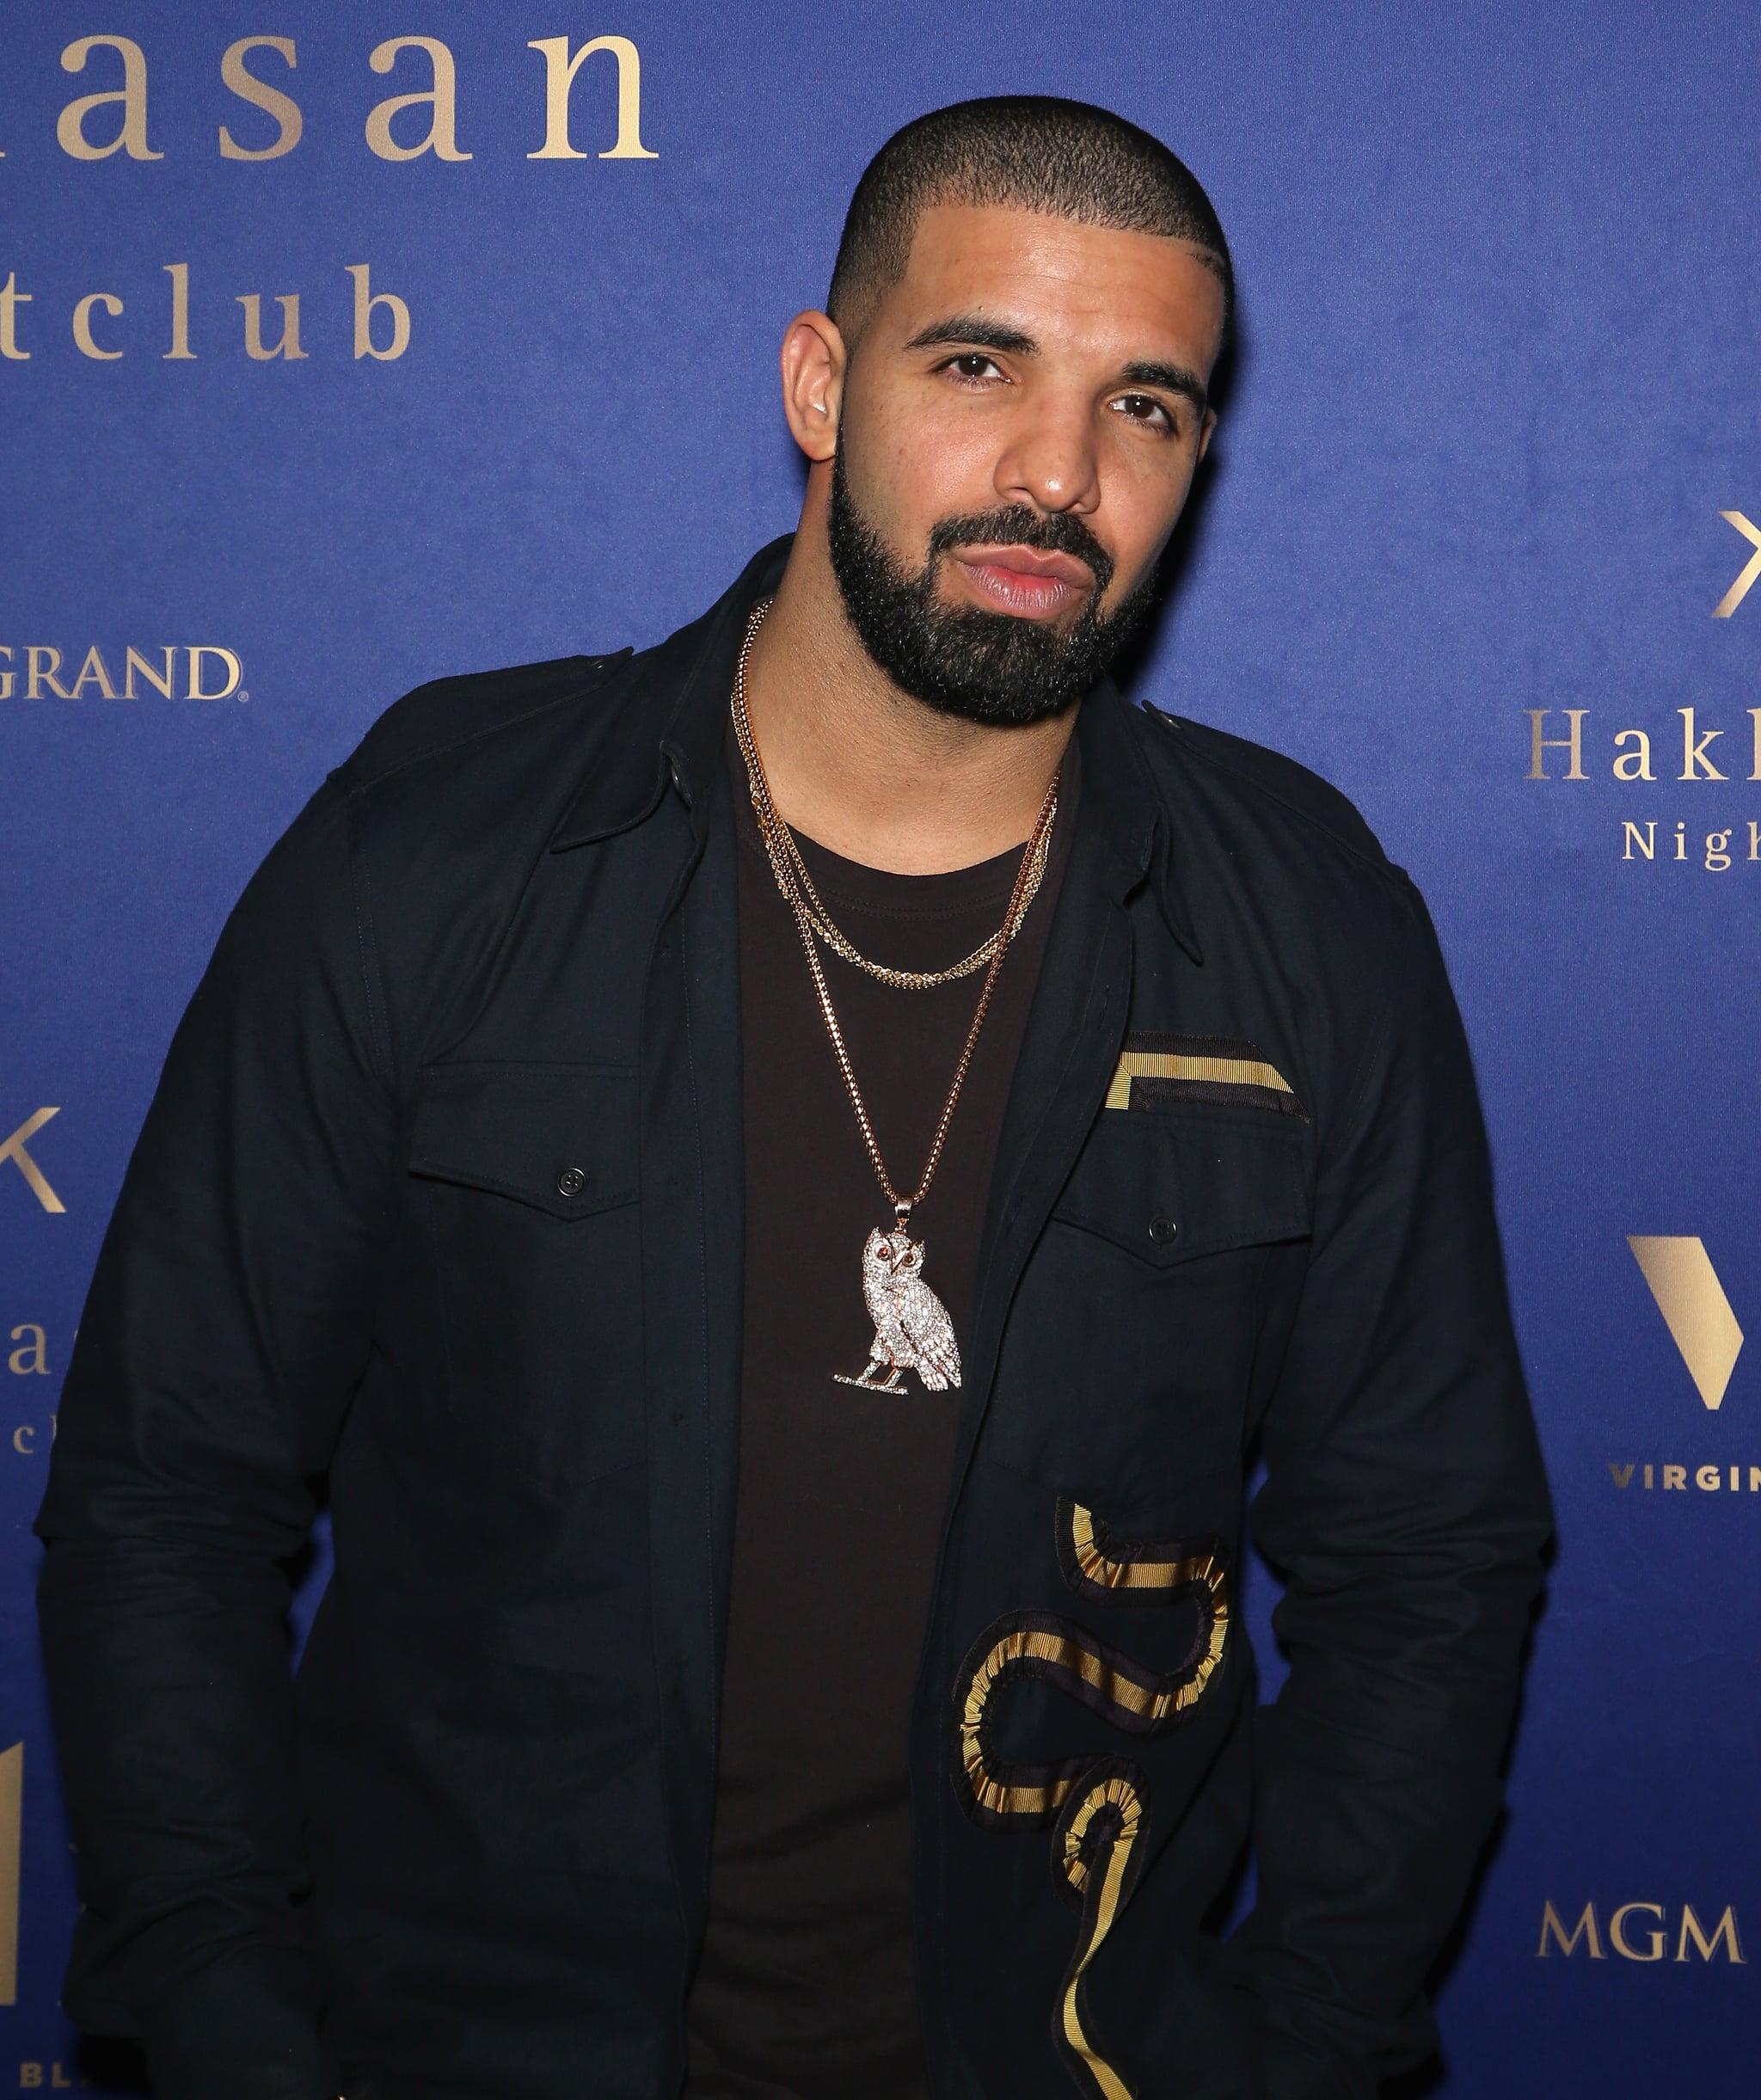 Drake: Drake Talks About Donald Trump At London Concert 2017